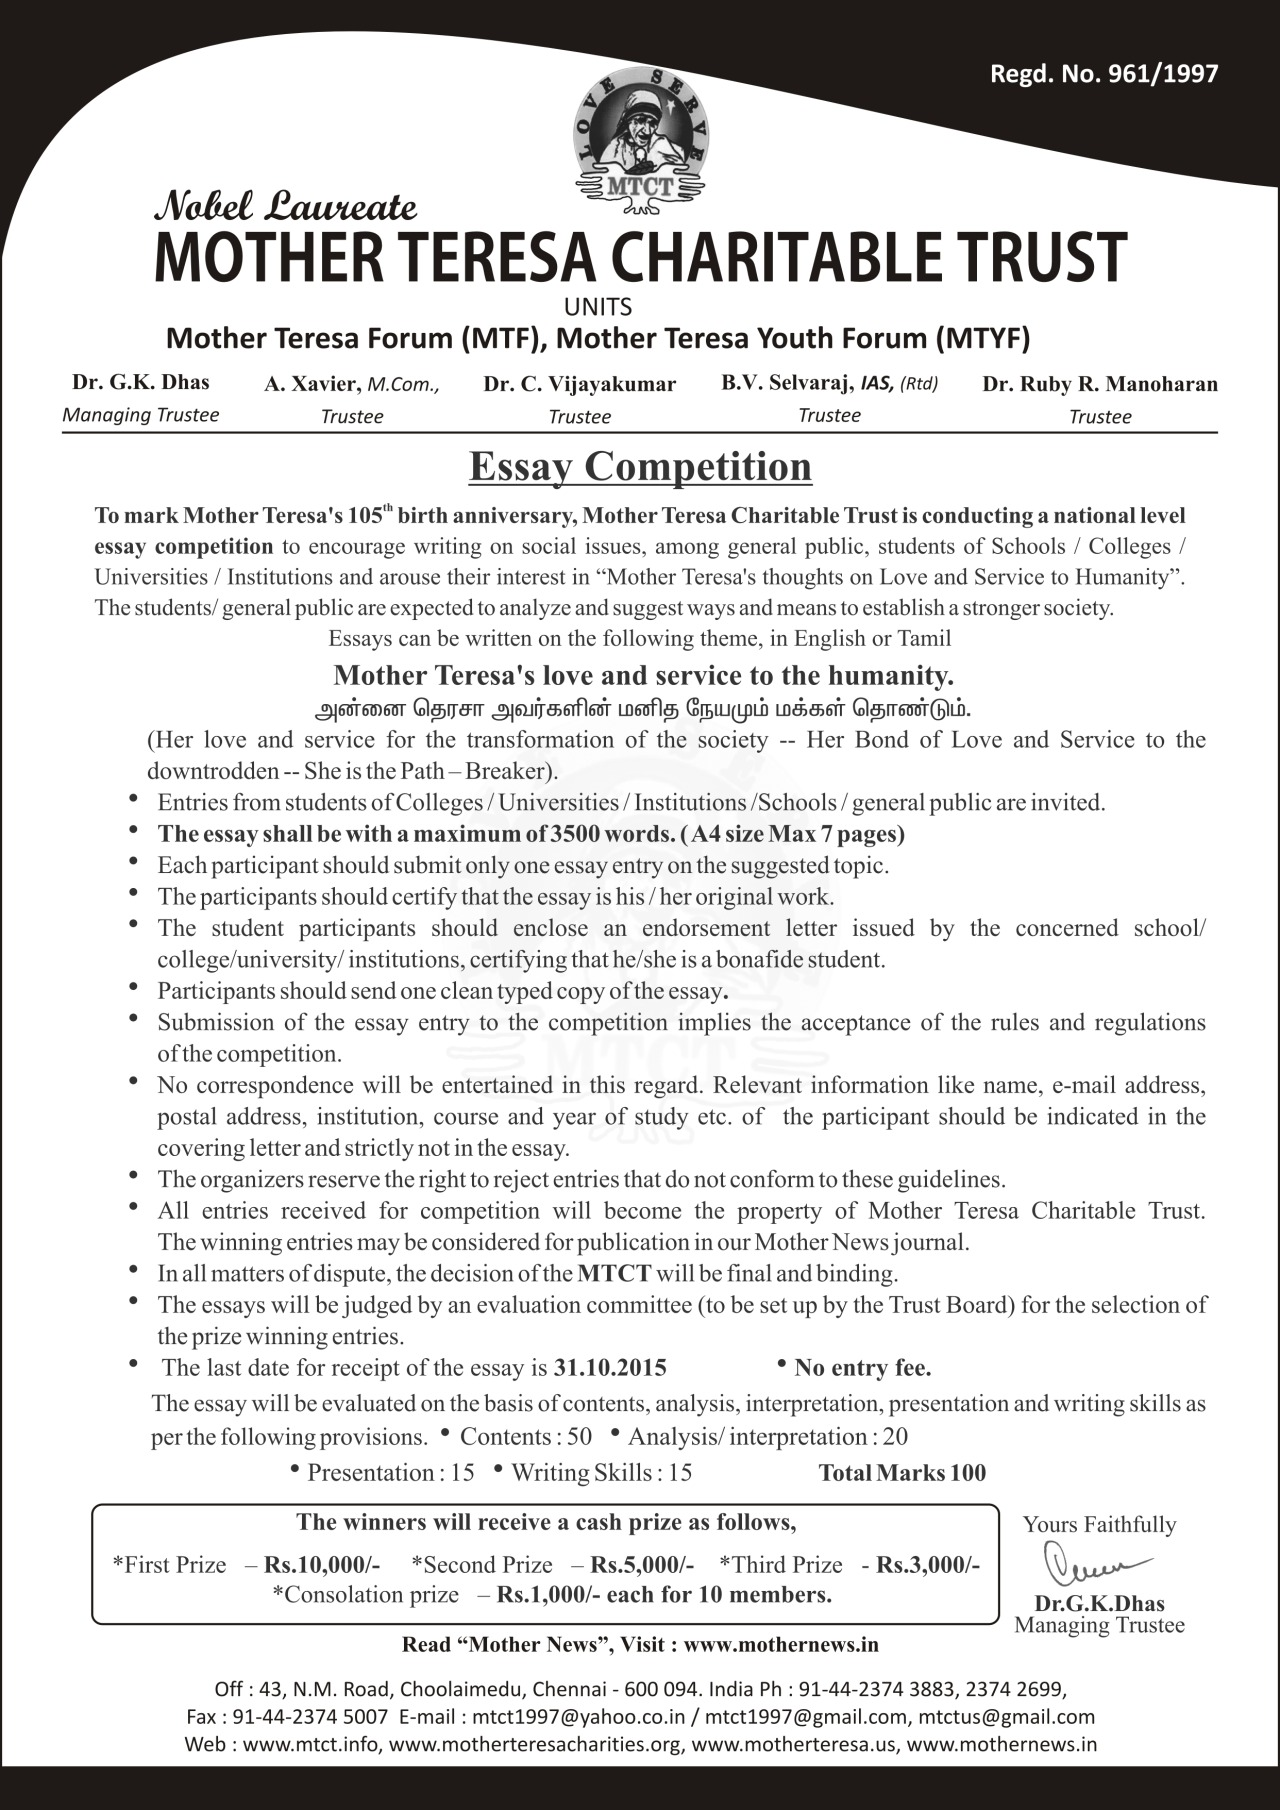 012 Trust Essay Tumblr Nv14i7scpj1ua8wu5o1 1280 Fantastic Topics In Hindi Essays Free Full